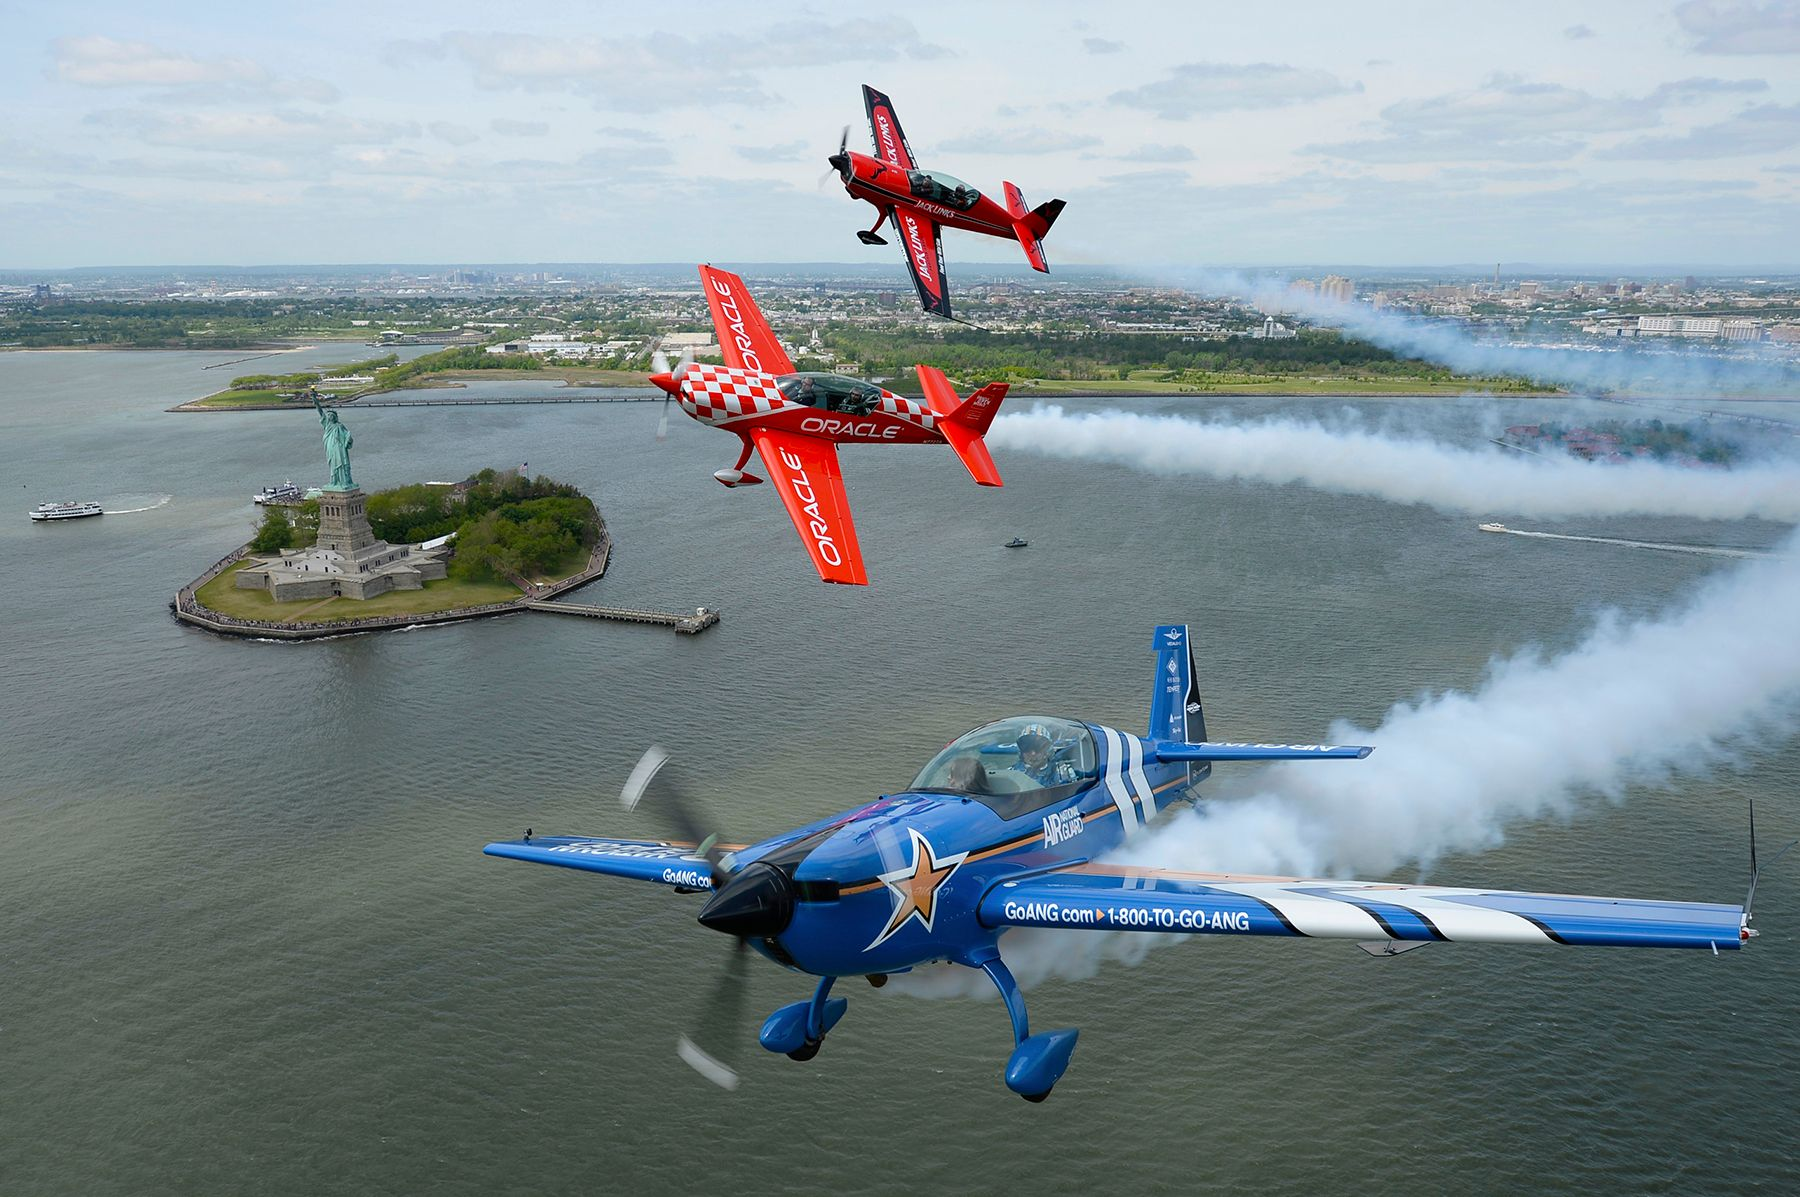 John KLATT Airshows